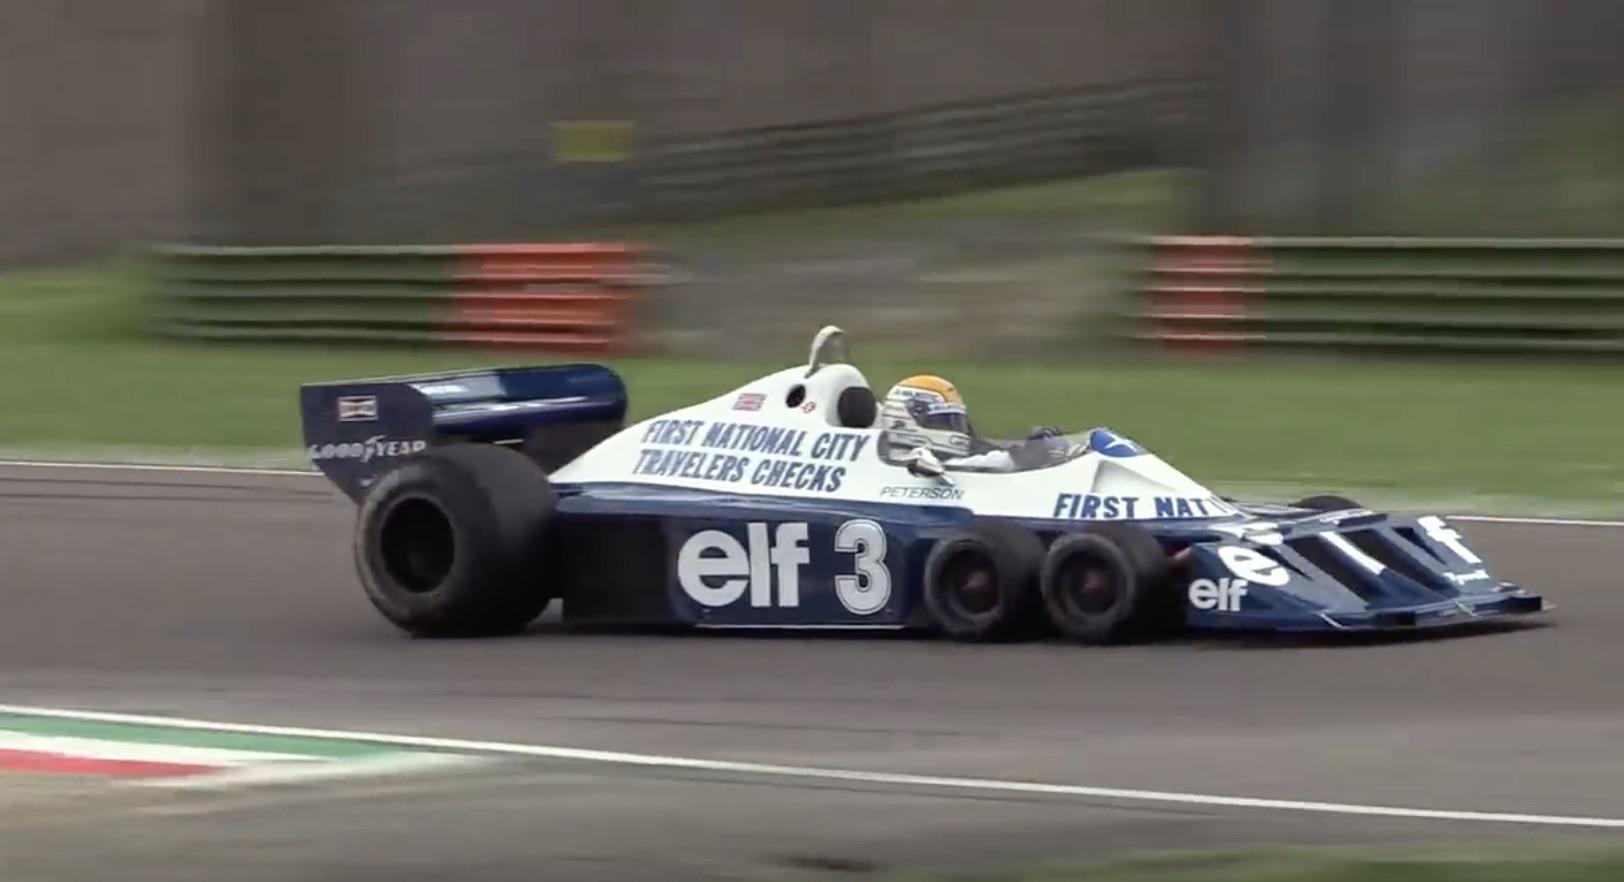 Morning Symphony: 1977 Tyrrell P34 – The Six-Wheeled Wonder At Imola